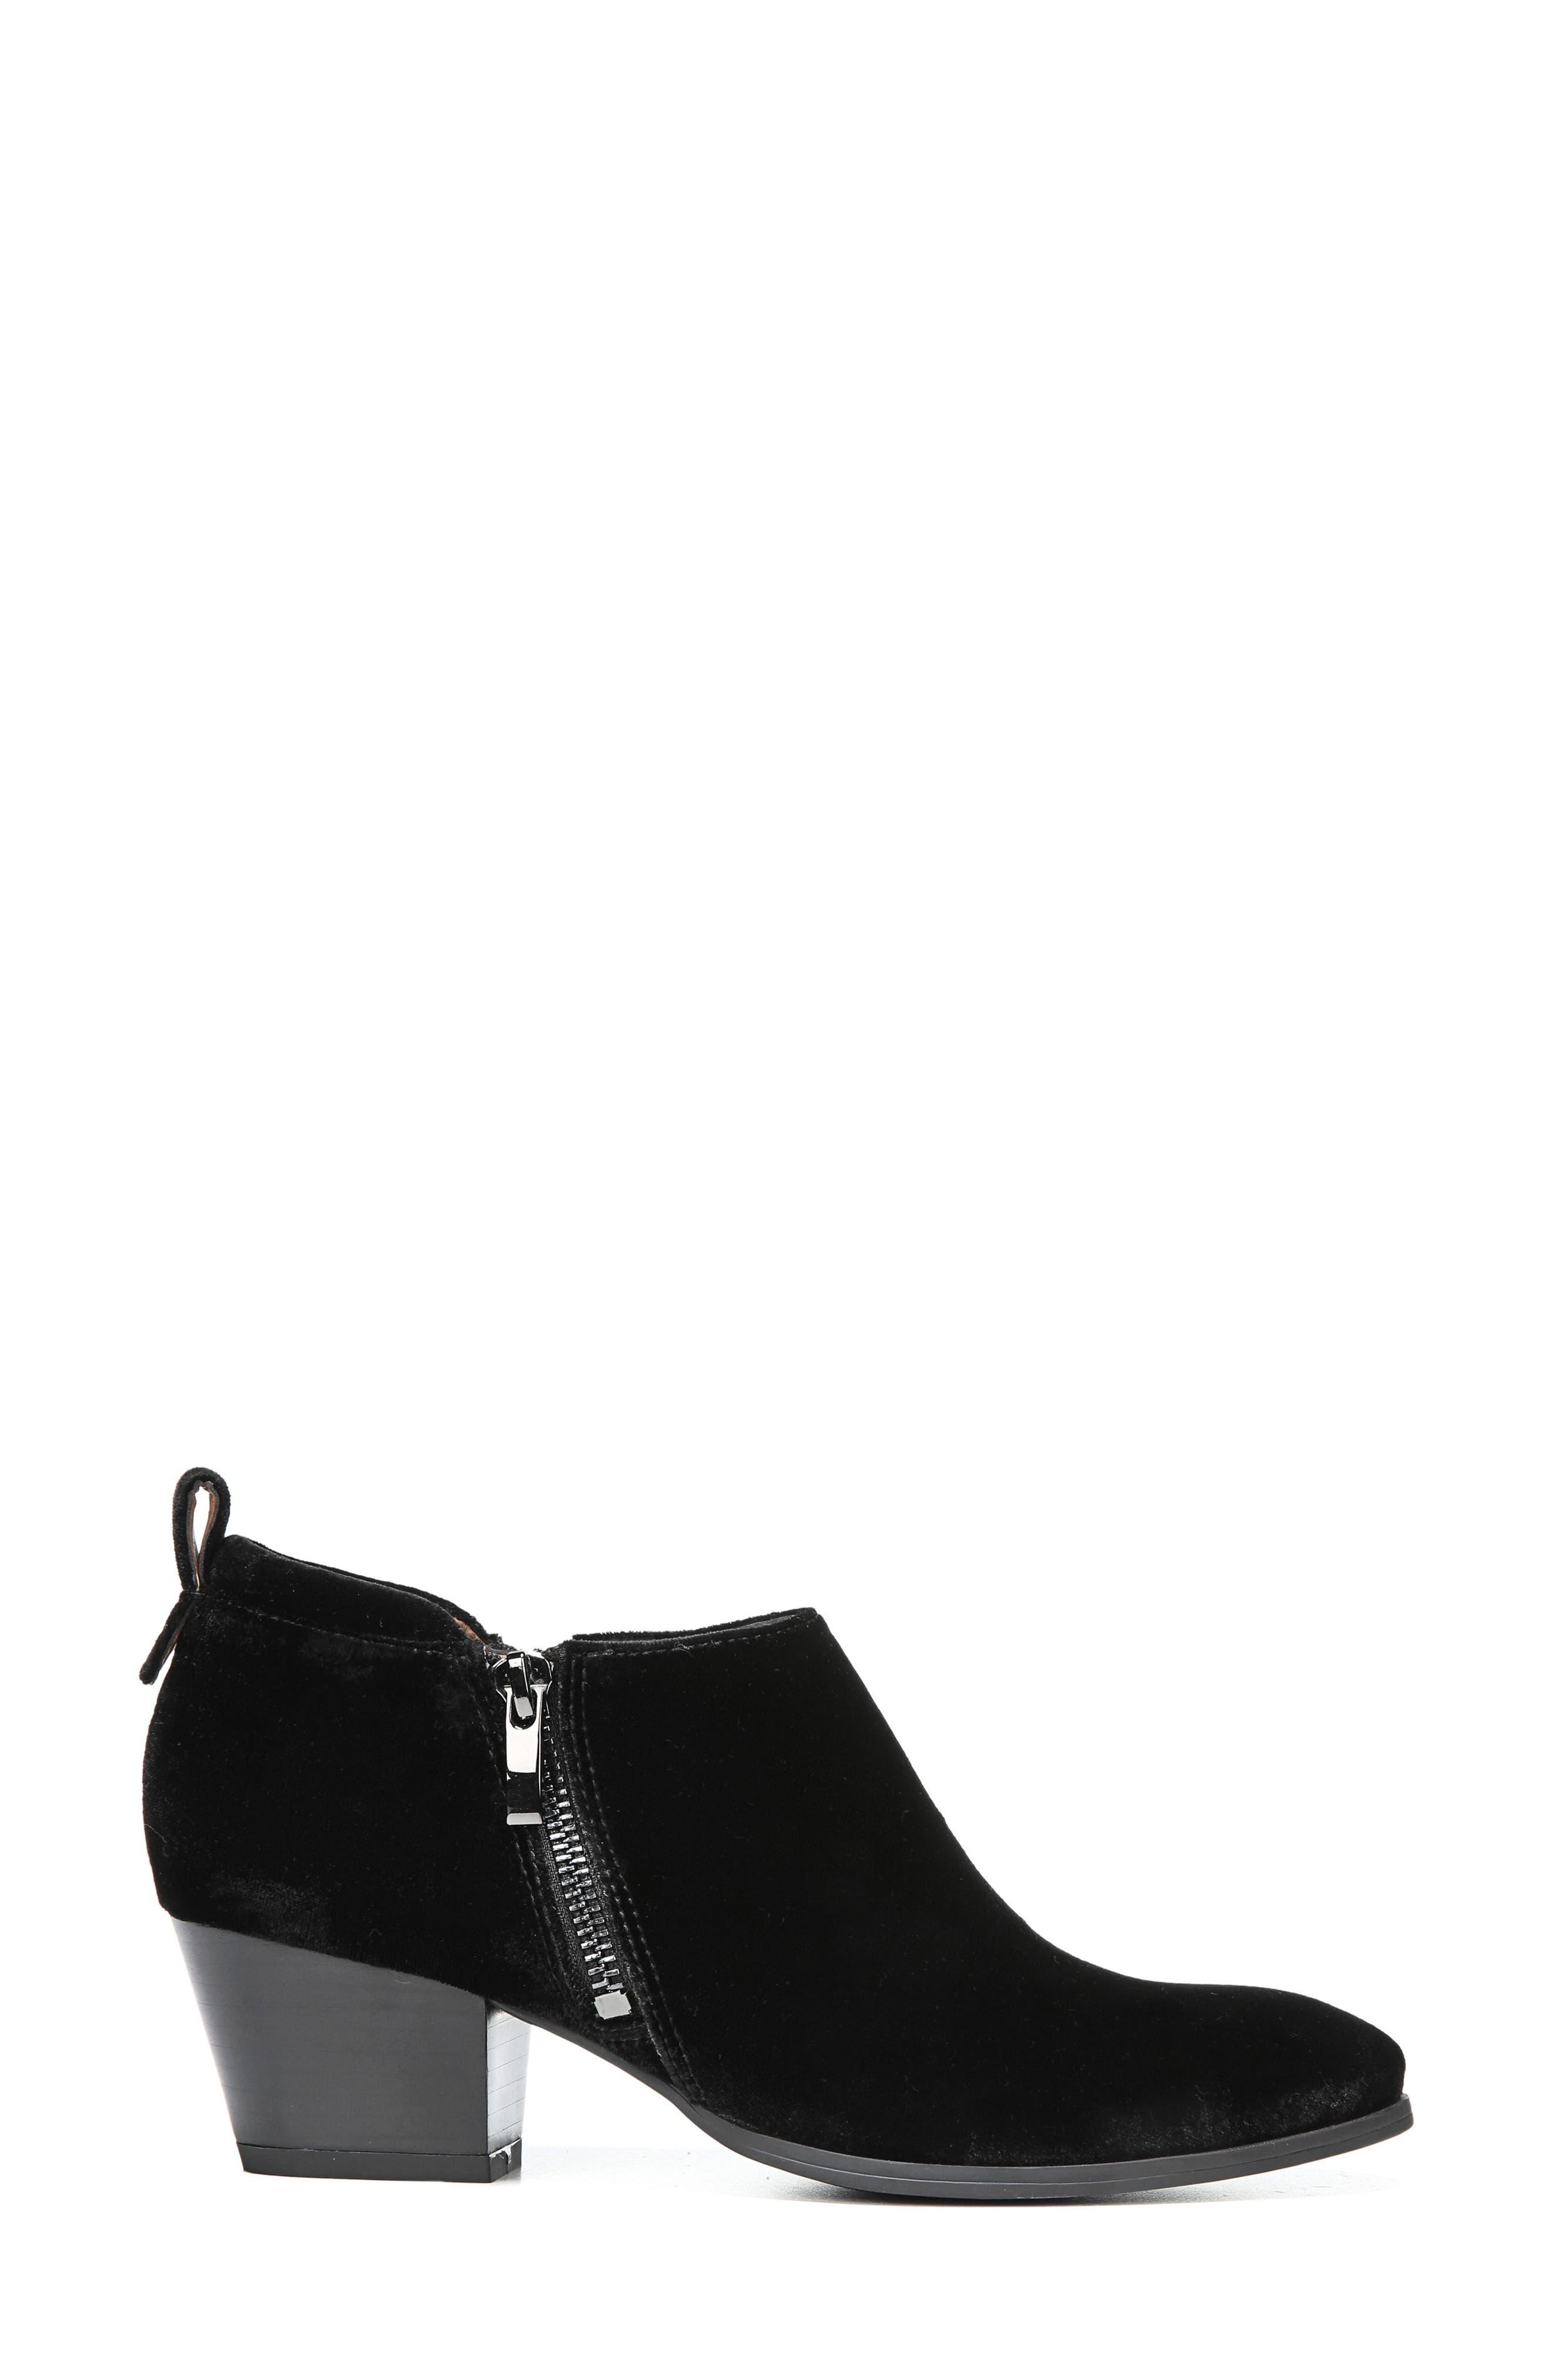 Alternate Image 3  - SARTO by Franco Sarto 'Granite' Block Heel Bootie (Women)